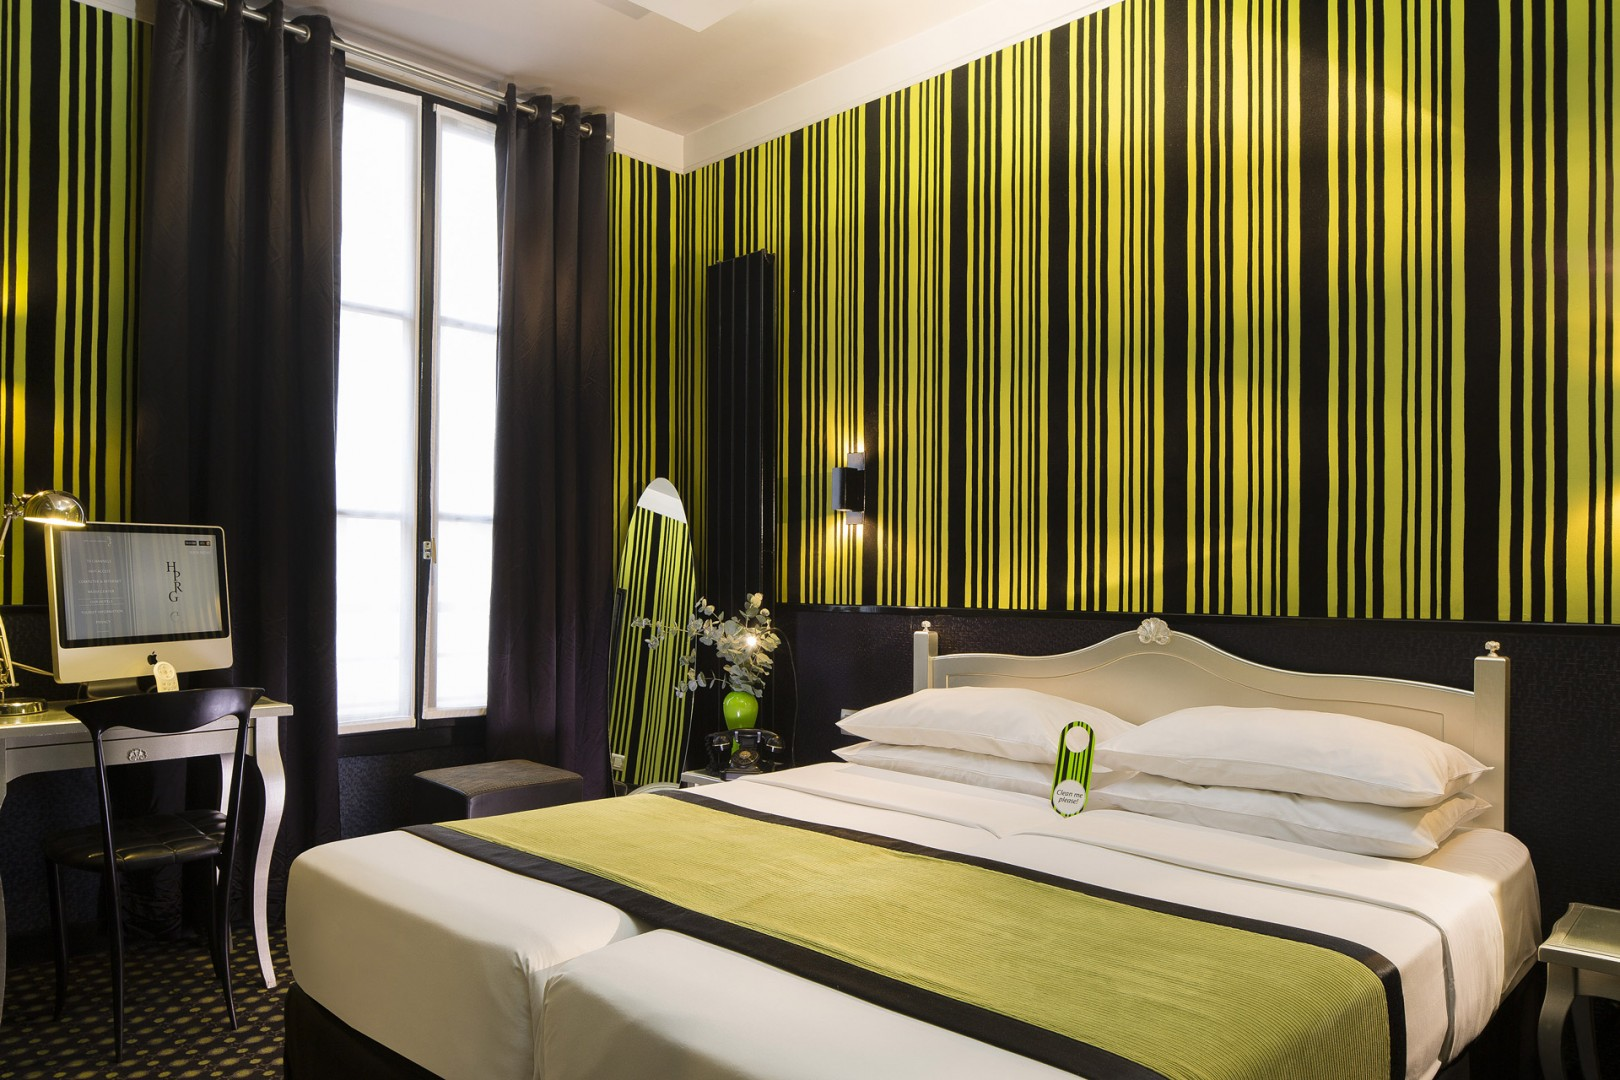 Galerie photos h tel design sorbonne paris panth on st for Hotel sorbonne